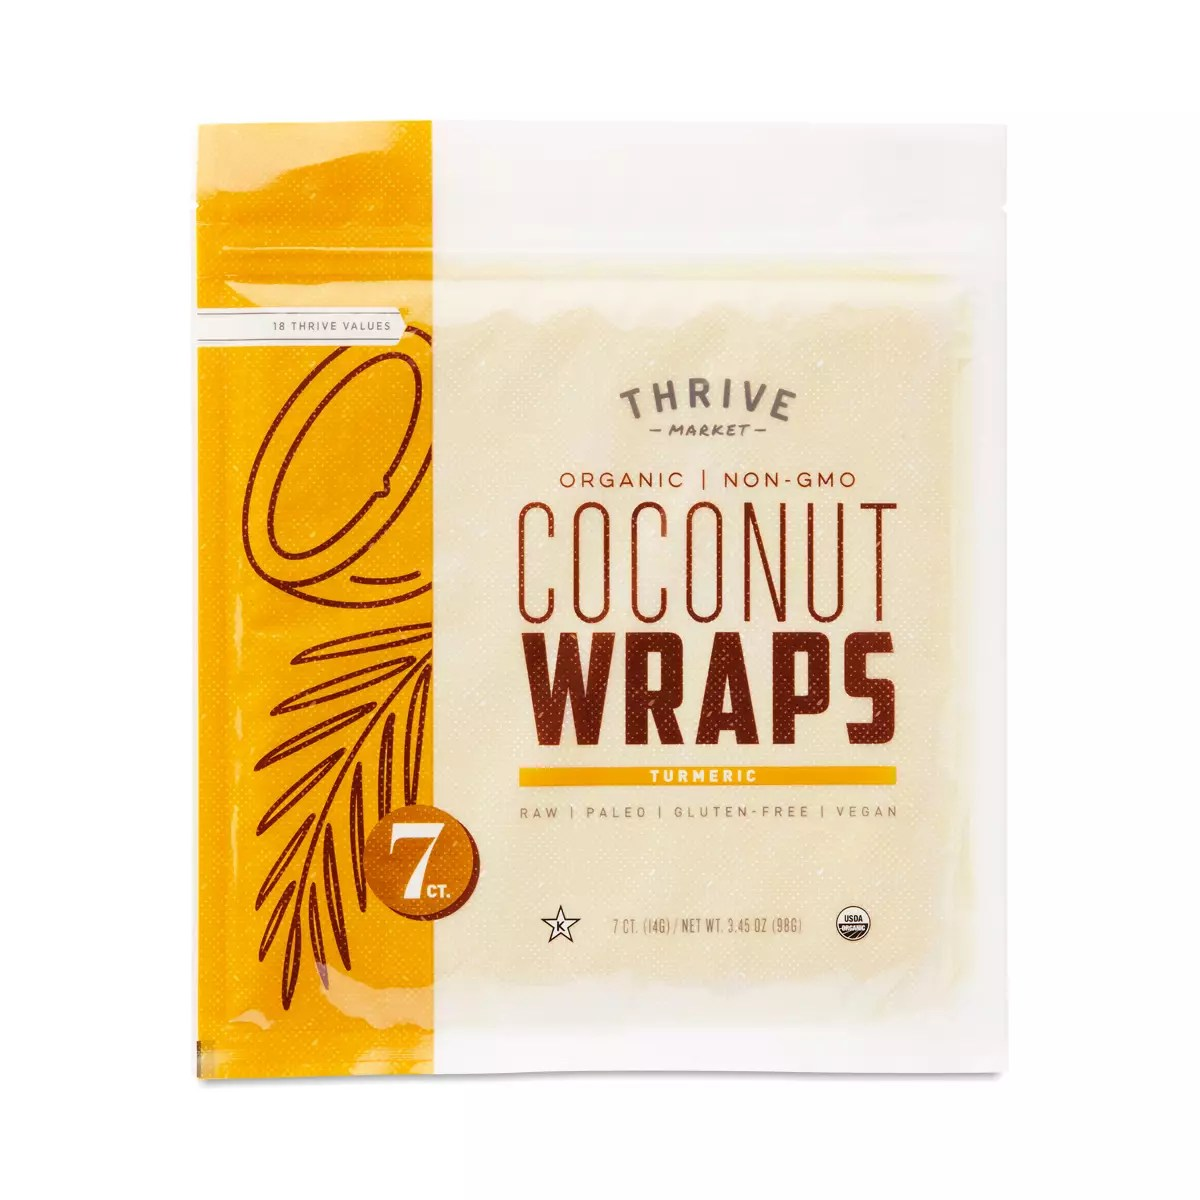 Organic Turmeric Coconut Wraps - Thrive Market